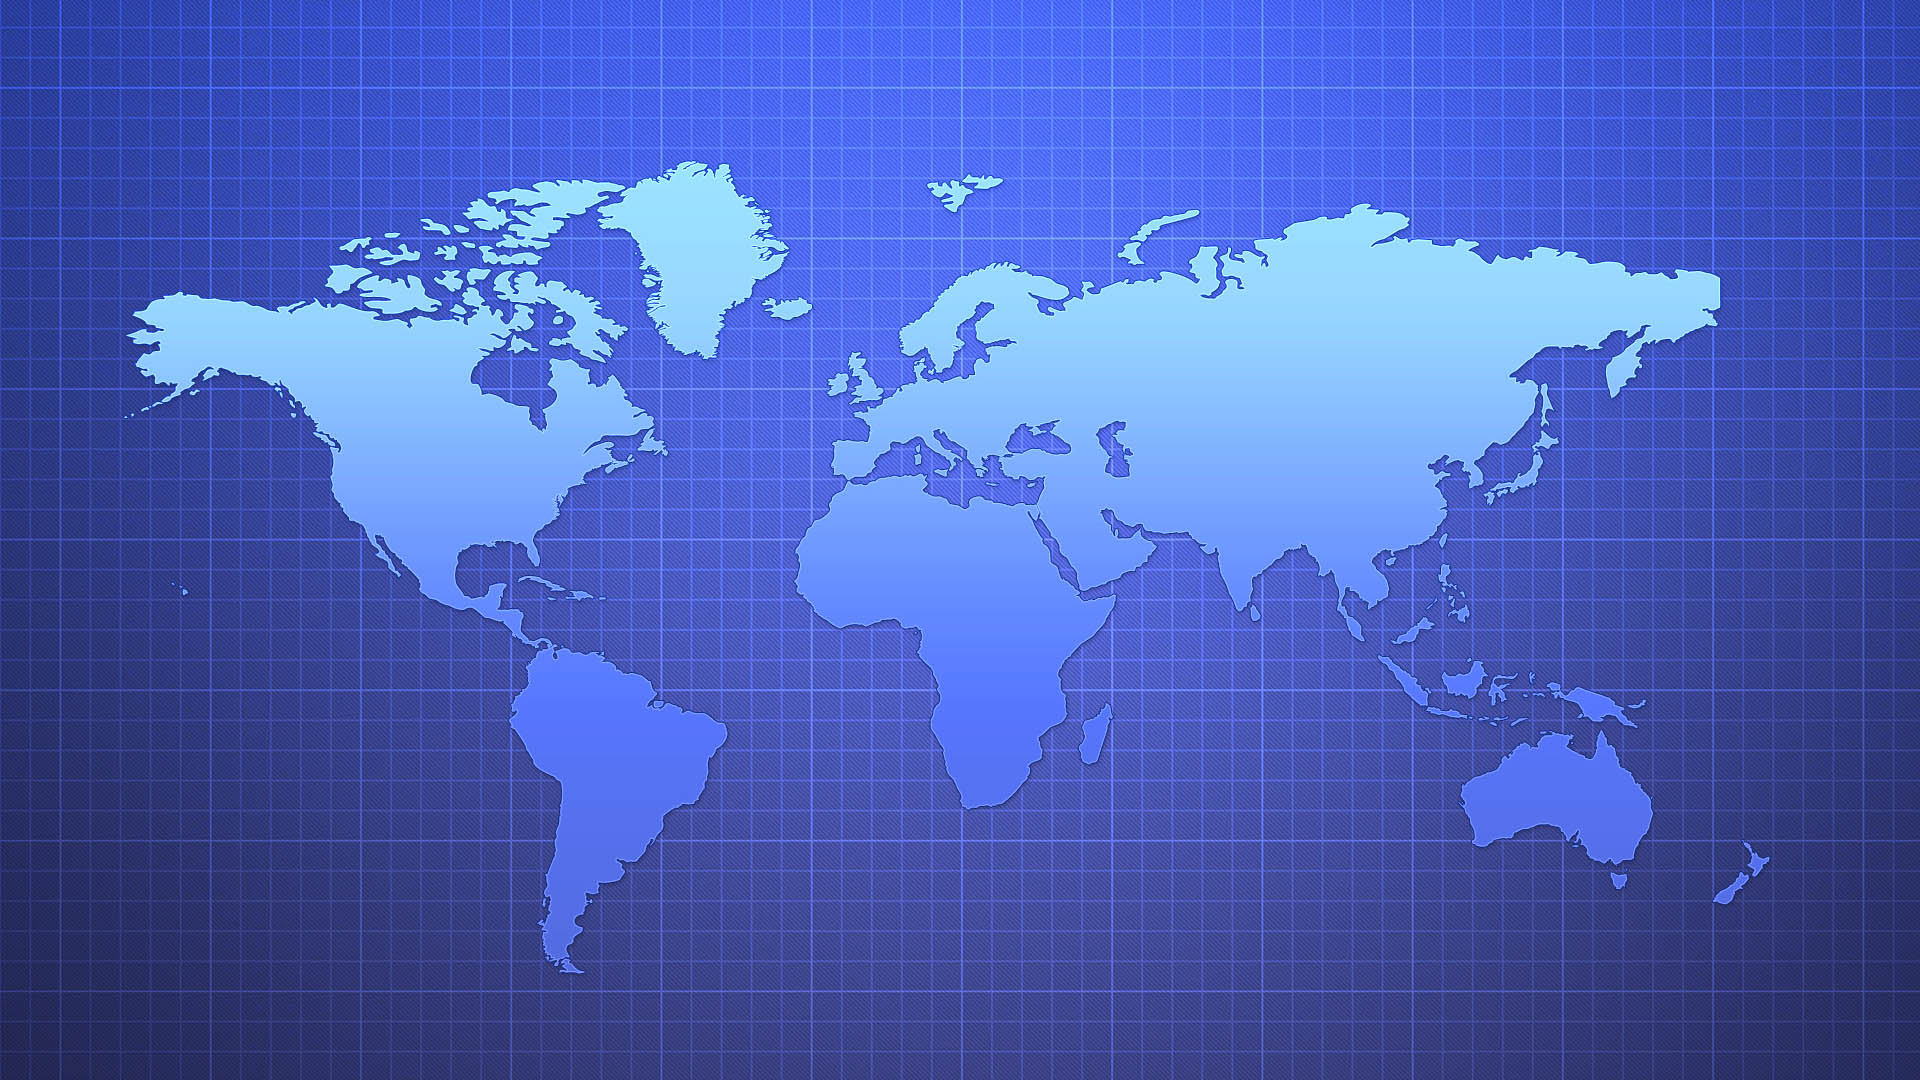 world map wallpaper 6249 6437 hd wallpapers Scube 1920x1080